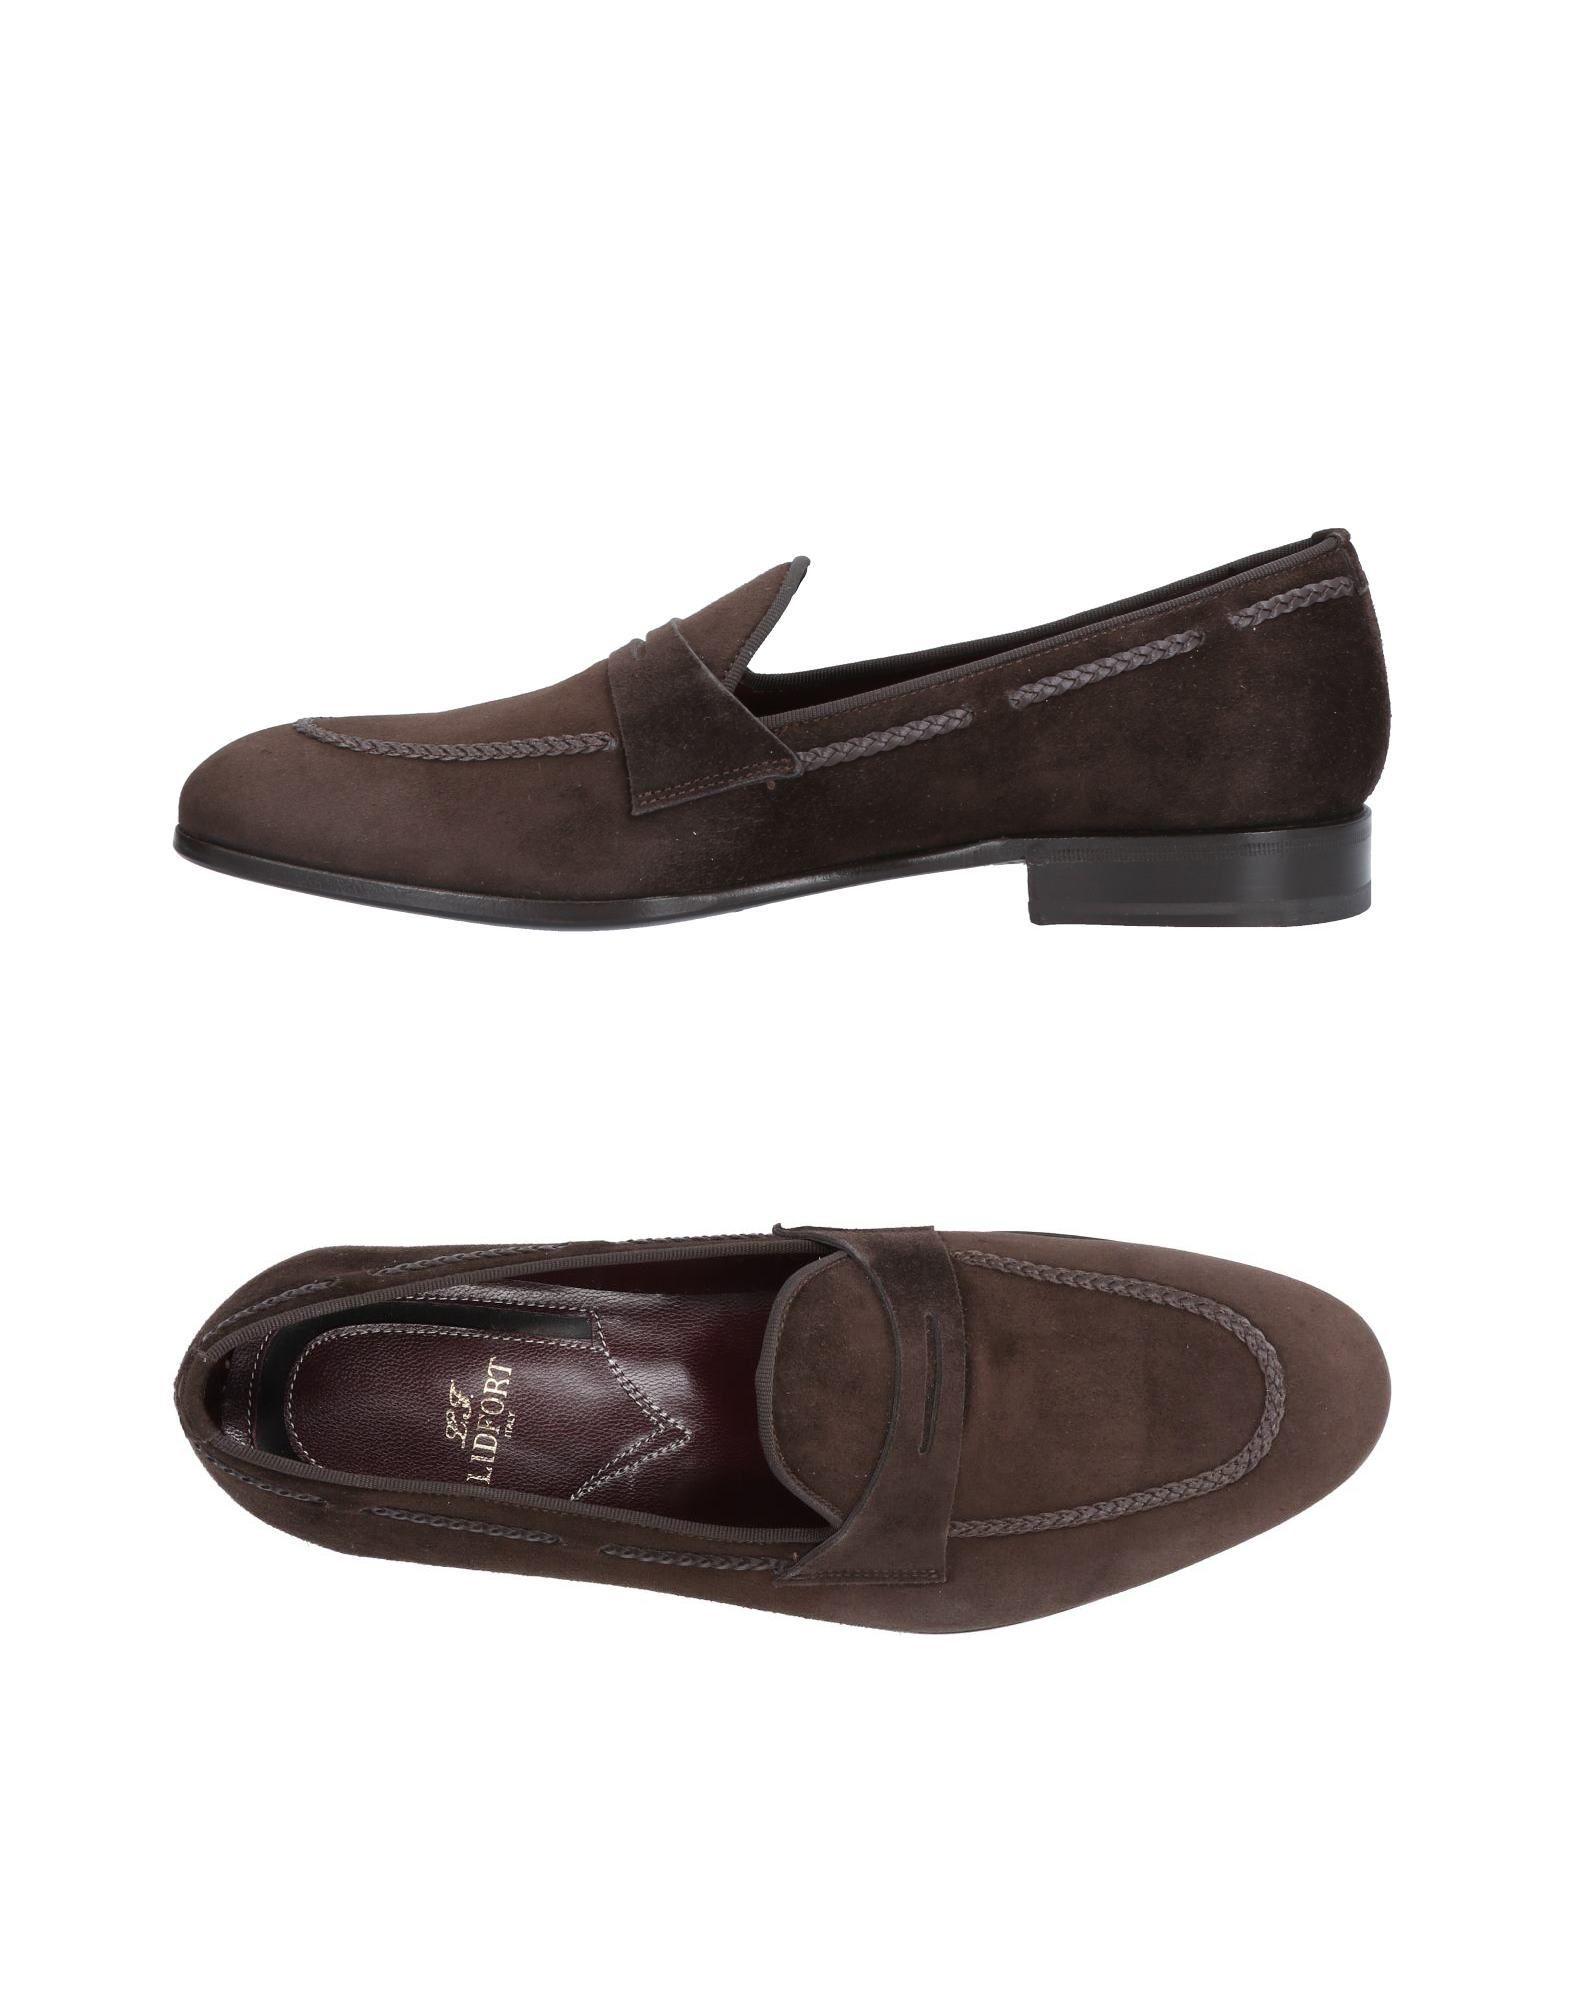 Lidfort Mokassins Herren  11491835NU Gute Qualität beliebte Schuhe